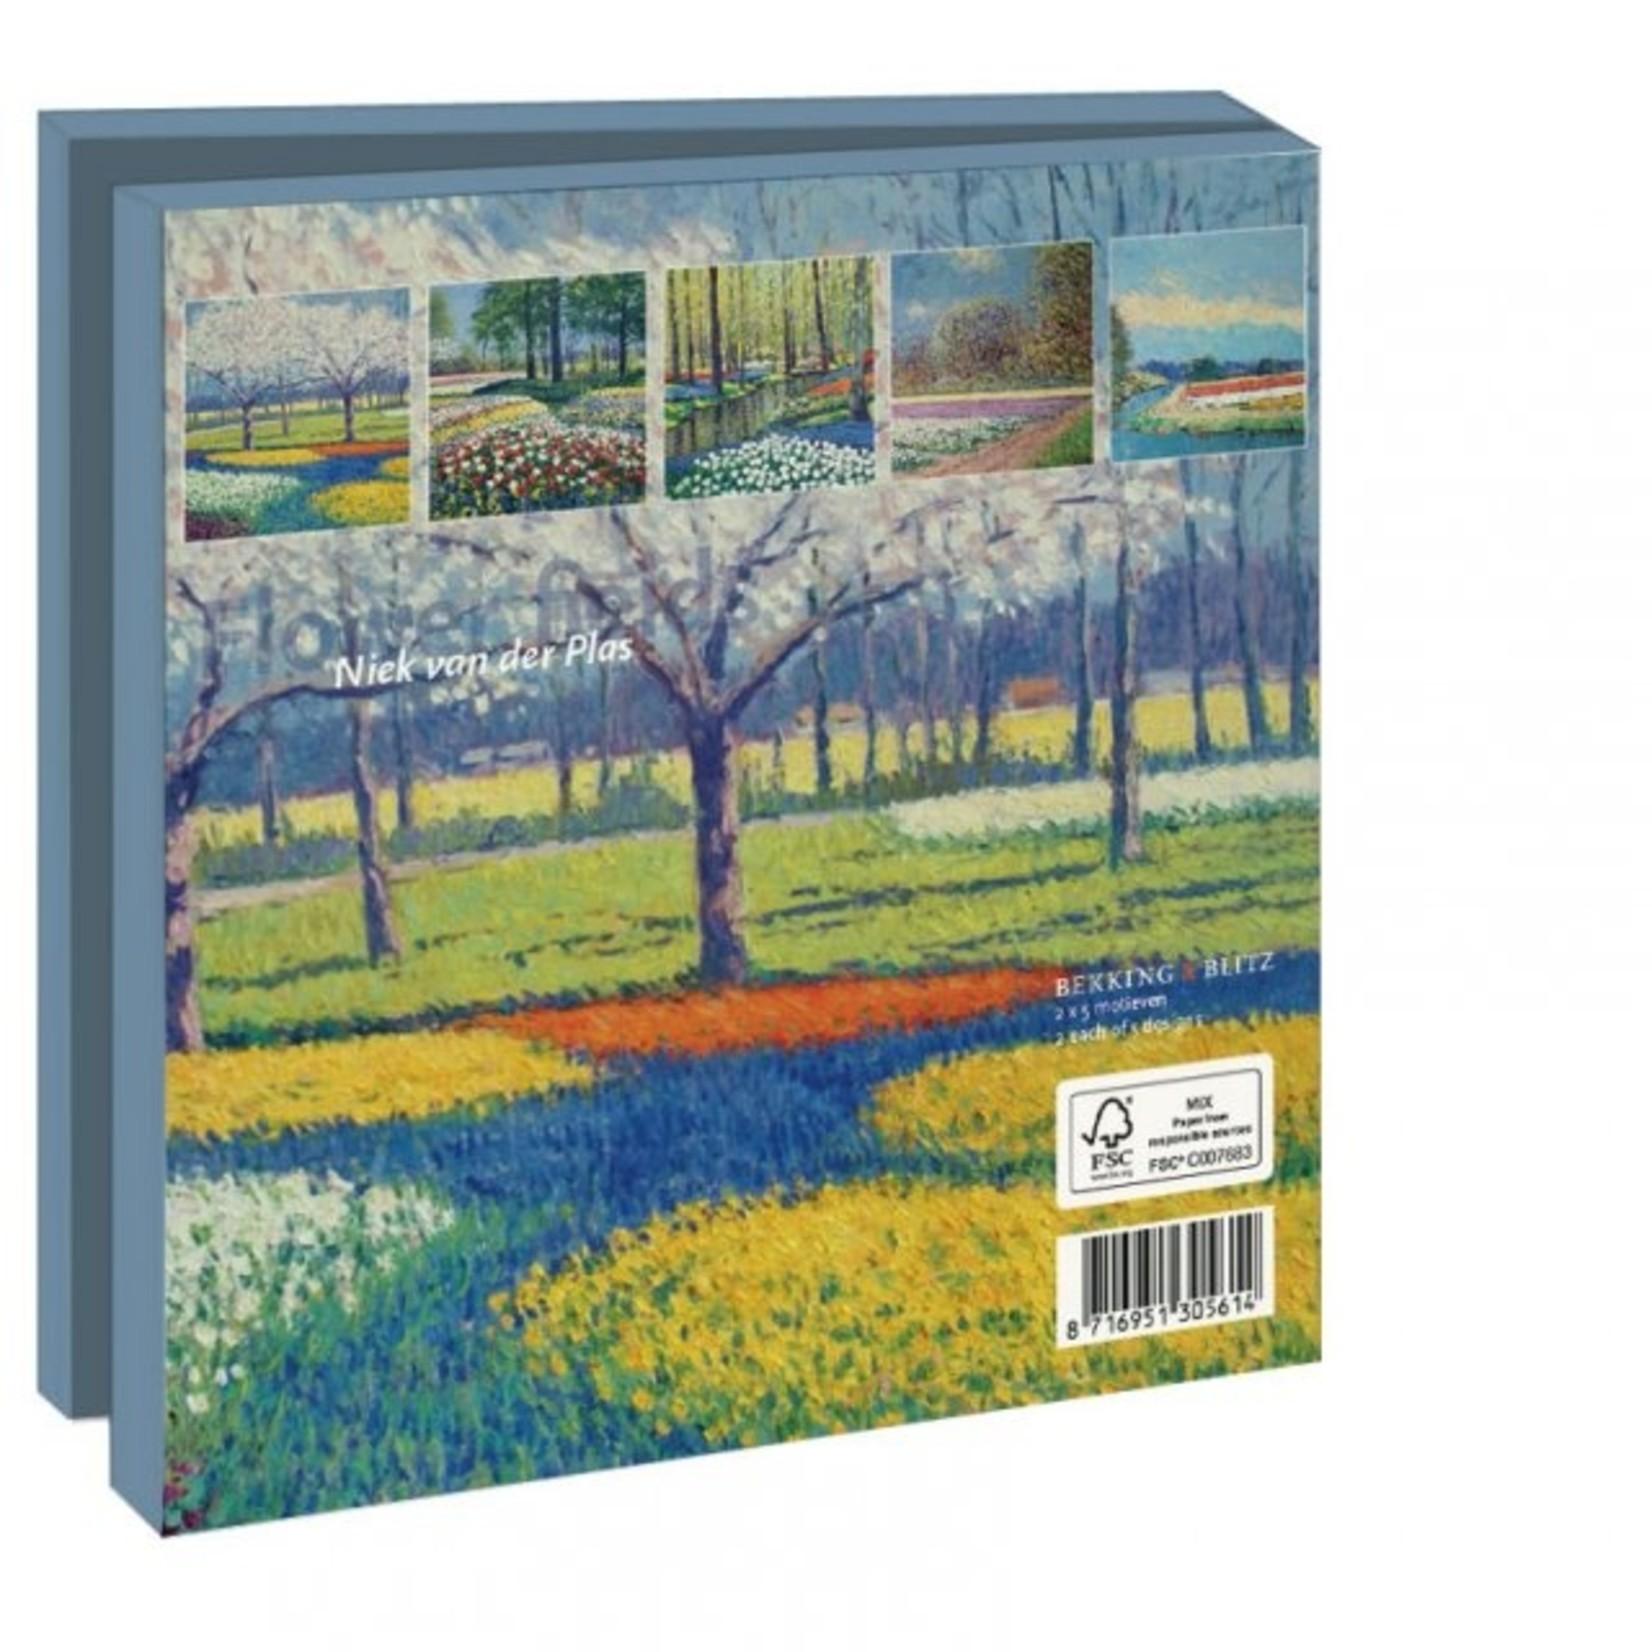 Bekking & Blitz Kaartenmap: Flower fields, Niek van der Plas